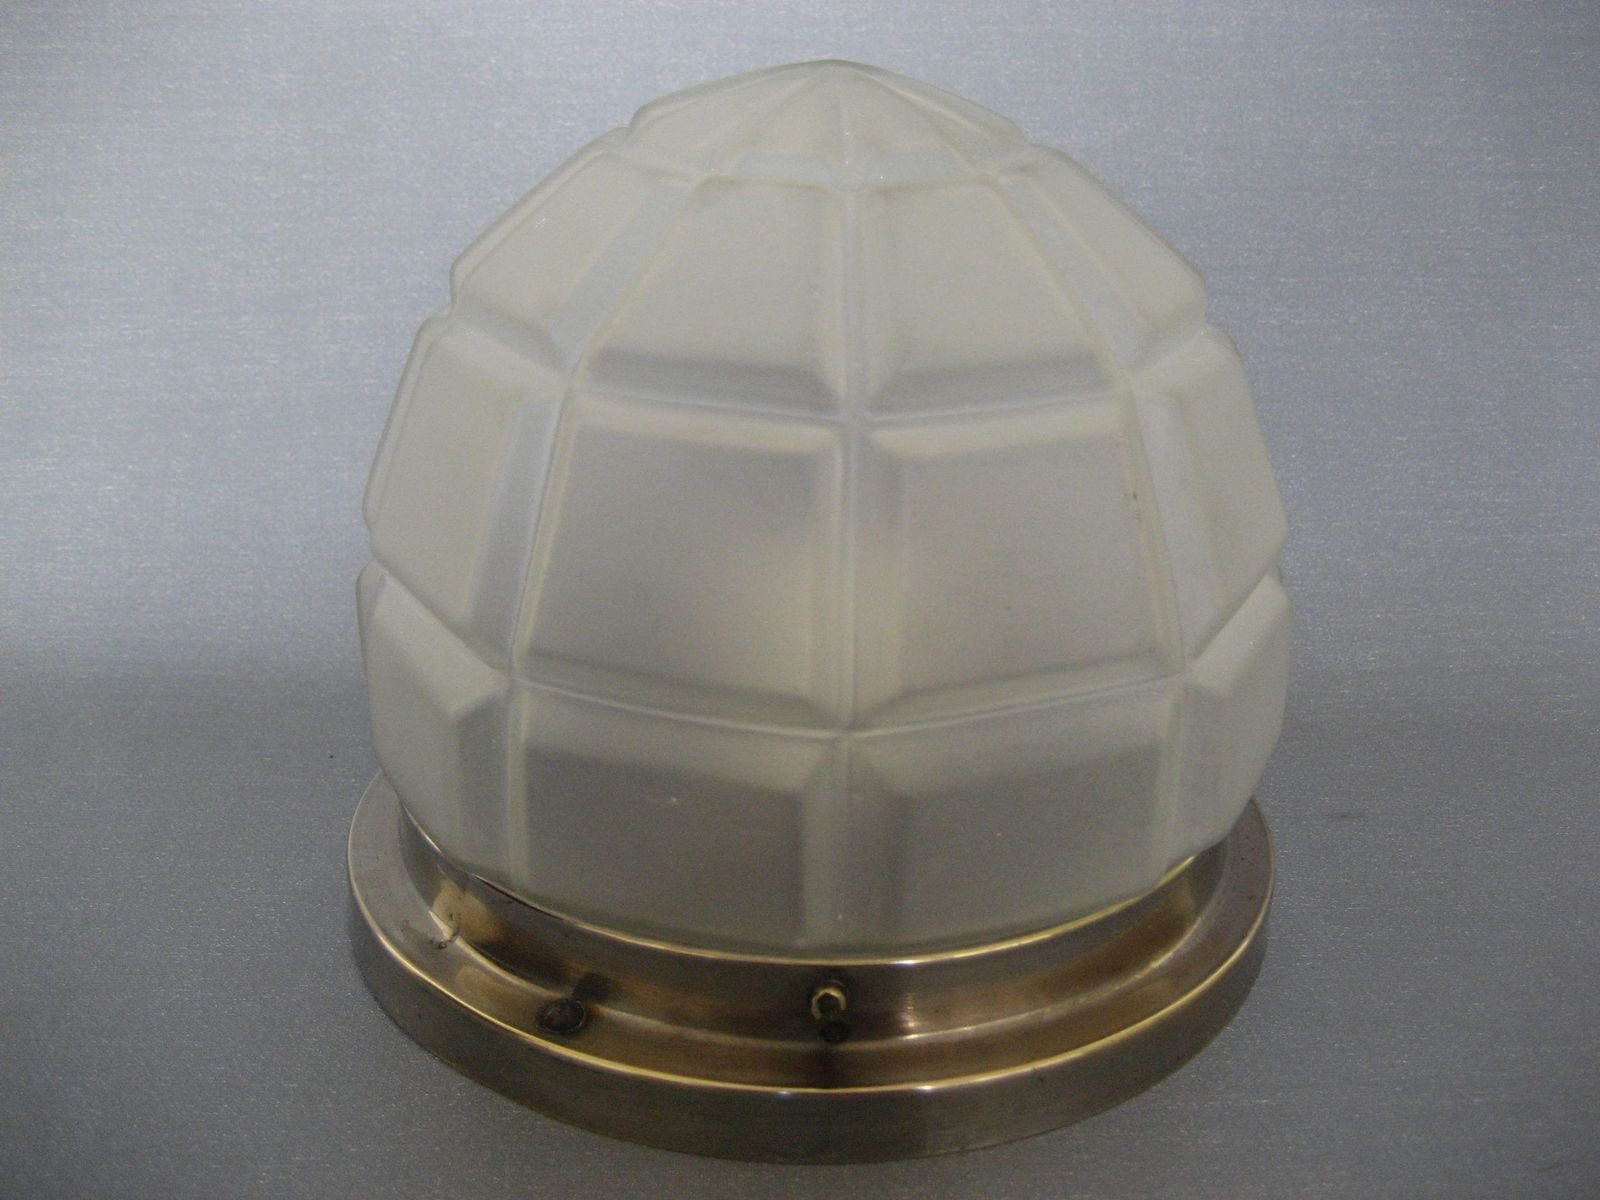 art deco deckenlampe aus verchromten messing glas. Black Bedroom Furniture Sets. Home Design Ideas